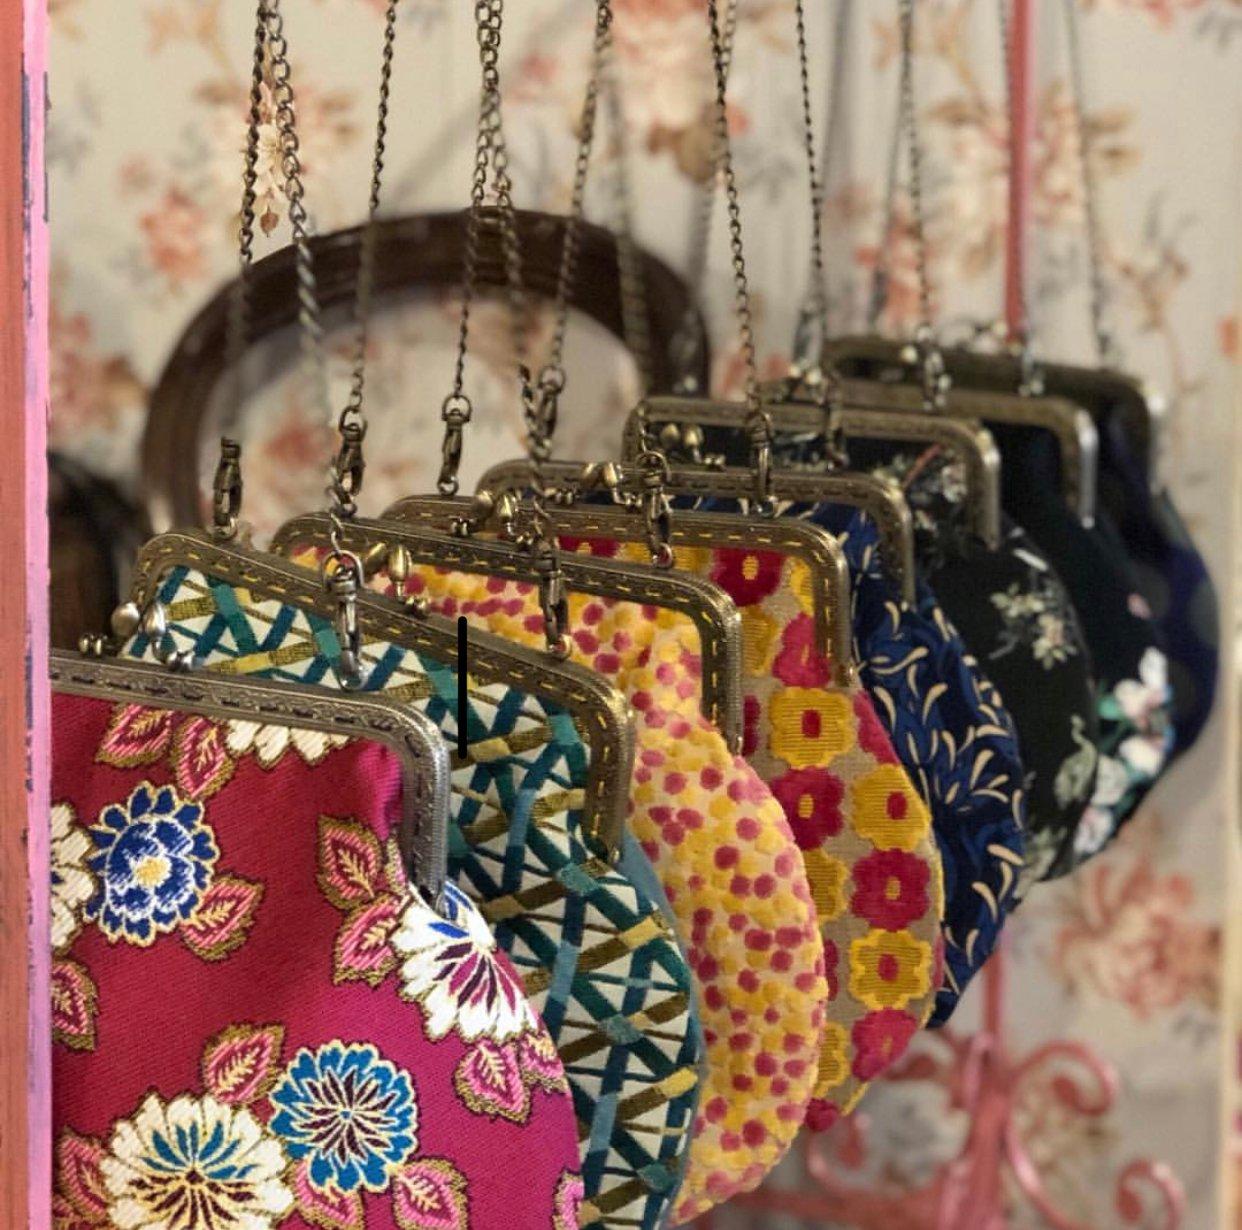 Image of Buono Regalo Giuggiola Bag